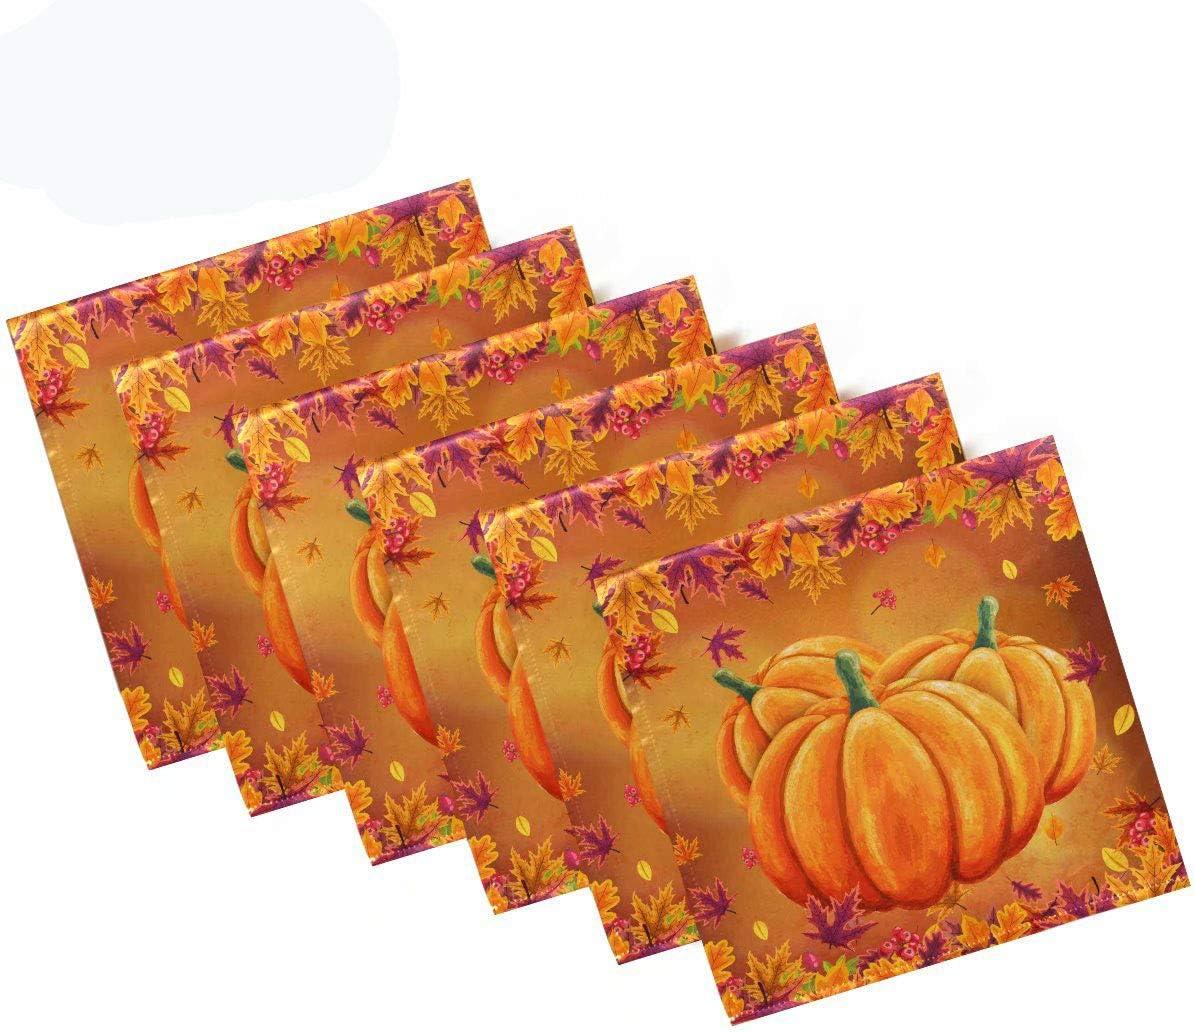 Pfrewn Autumn Pumpkin Maple Leaf Cloth Napkins Set of 6 Fall Sunflower Dinner Napkins Solid Washable Reusable Polyester Table Napkins Oversized 20